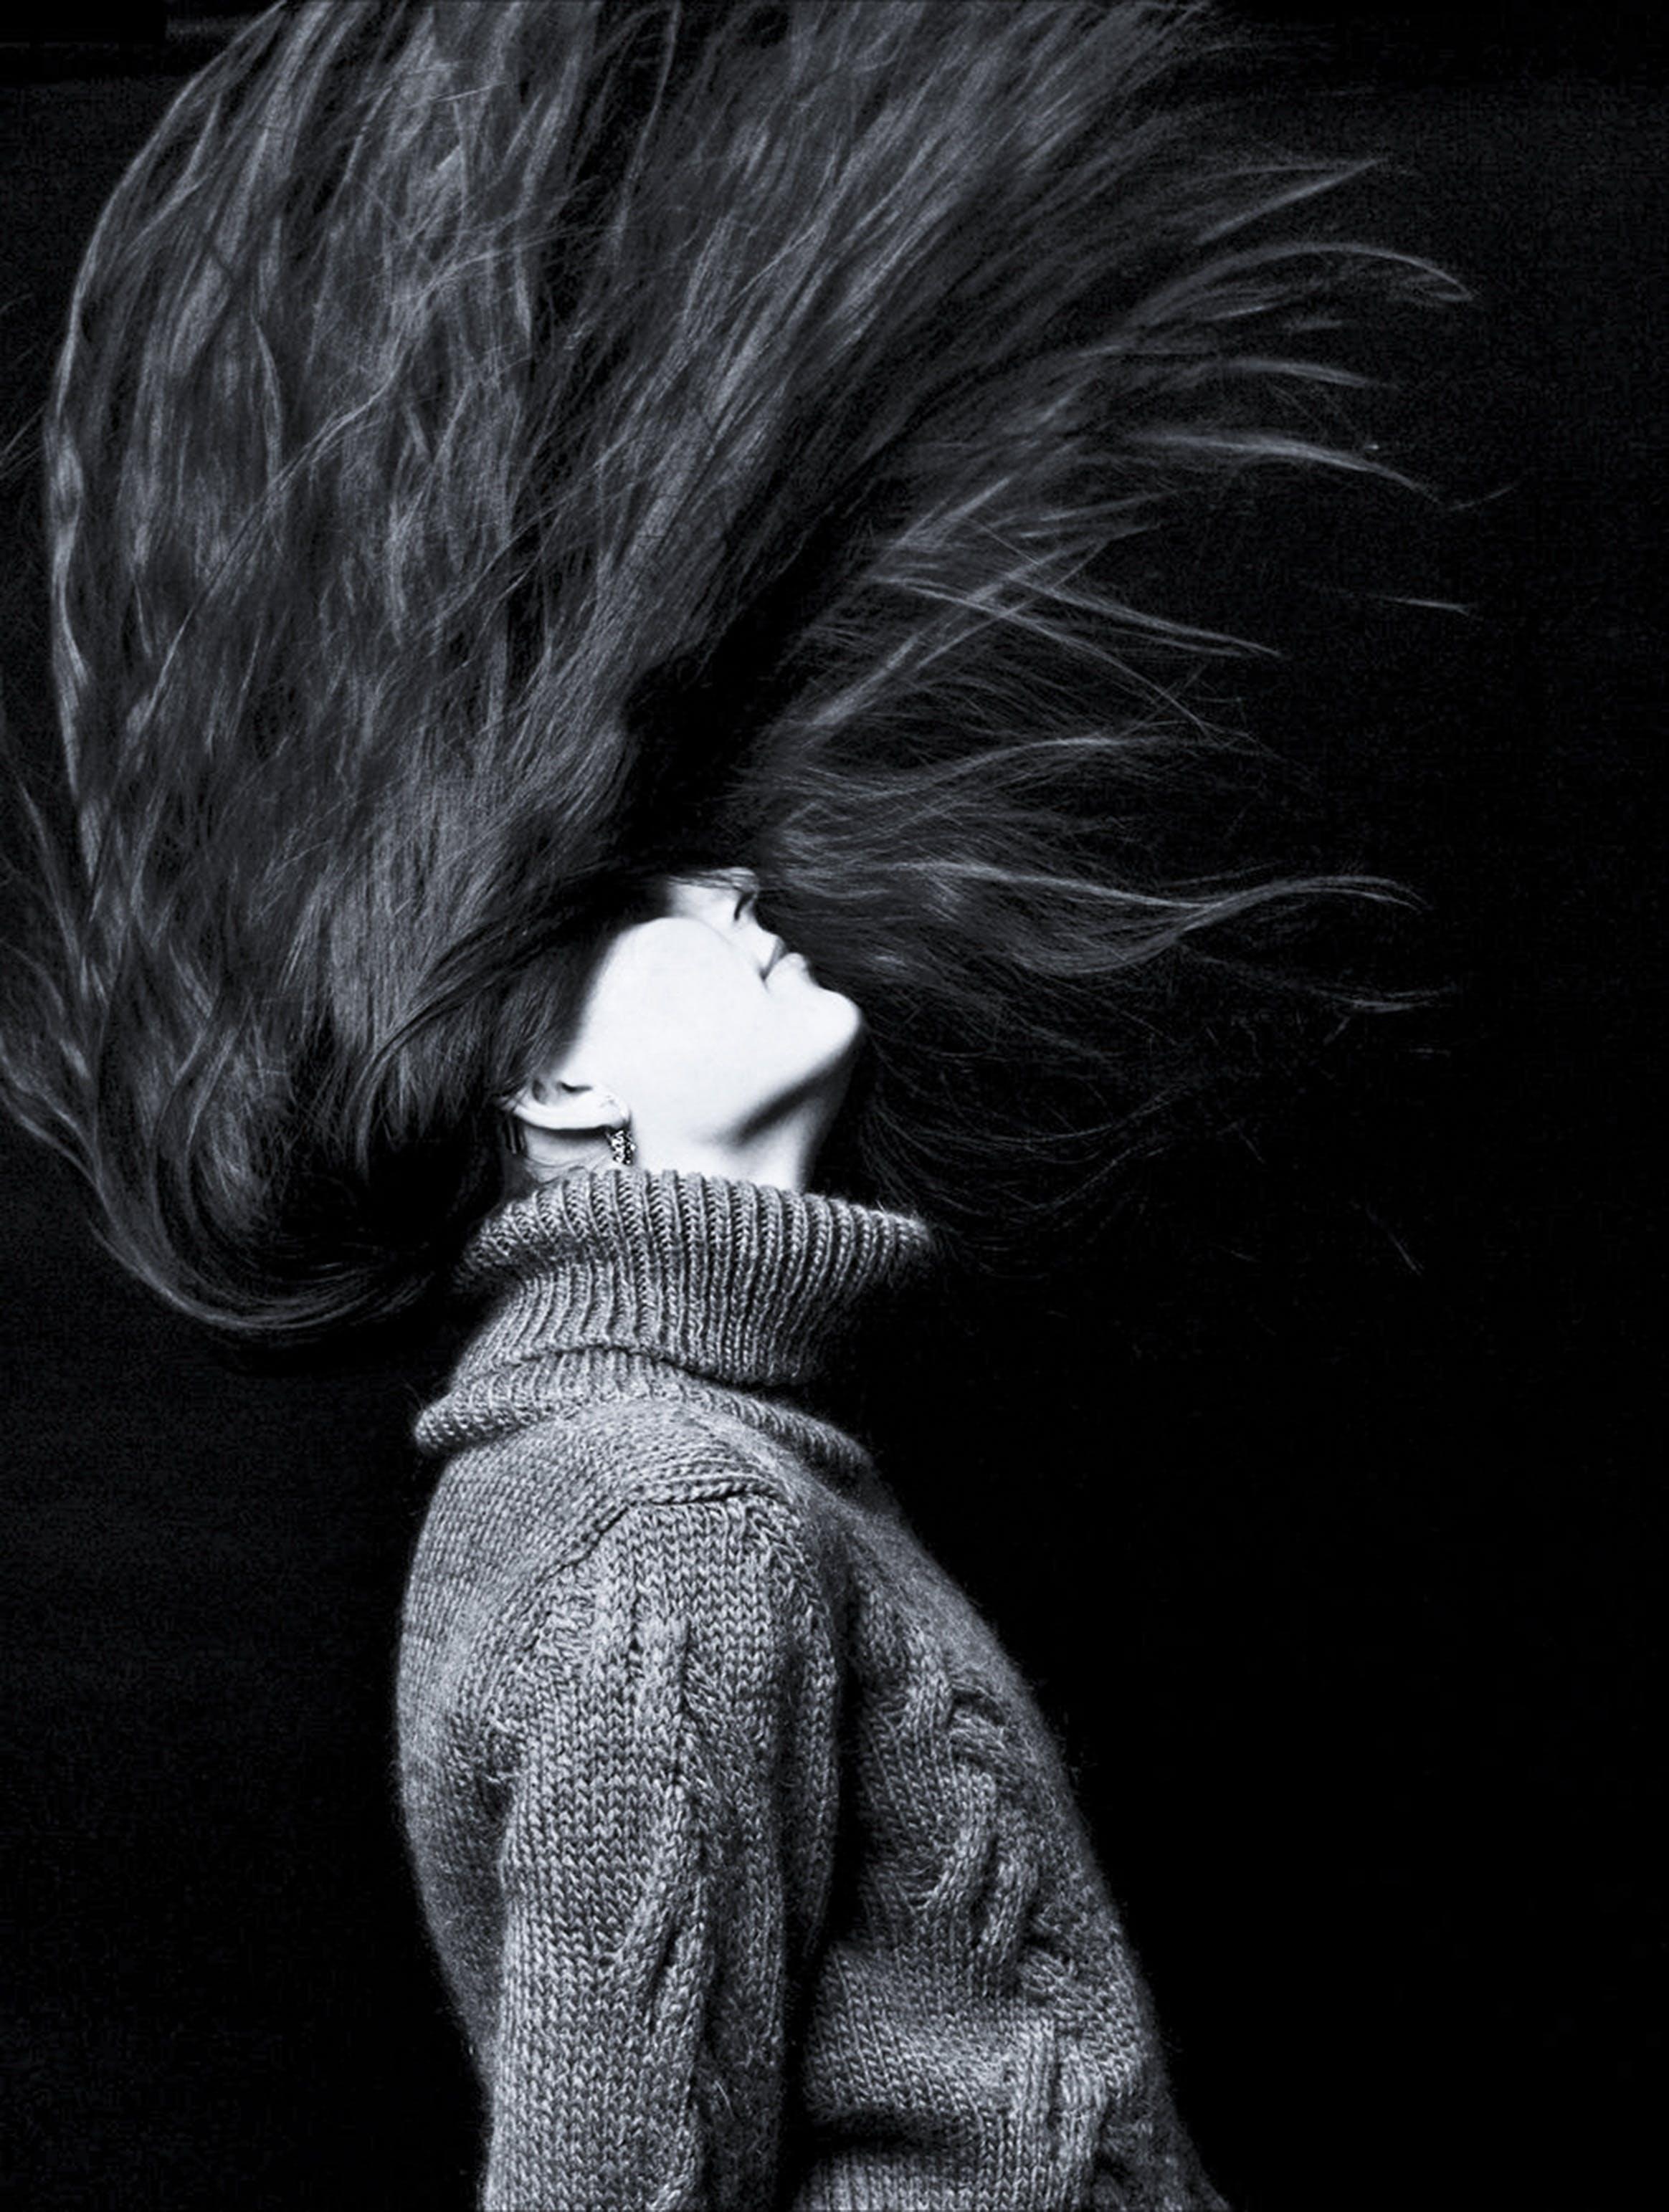 Kostenloses Stock Foto zu frau, haar, hübsch, kunst